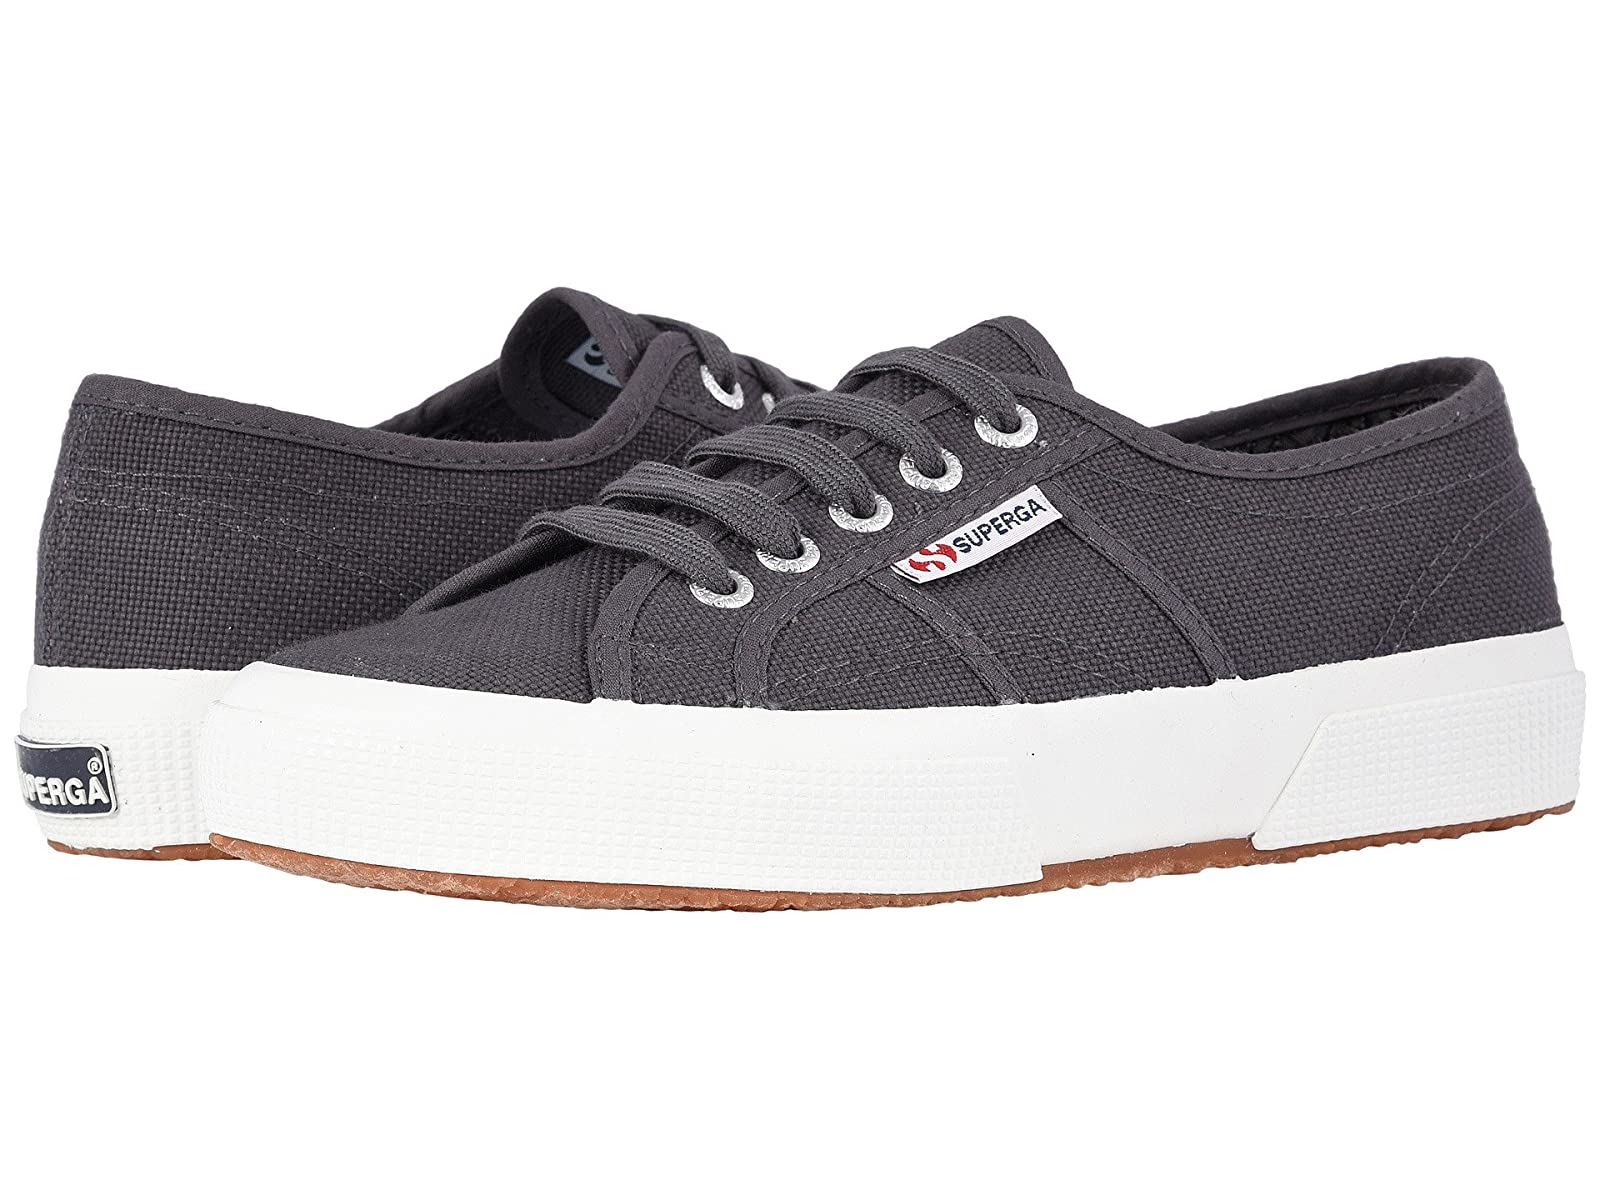 Superga 2750 COTU Classic SneakerAtmospheric grades have affordable shoes